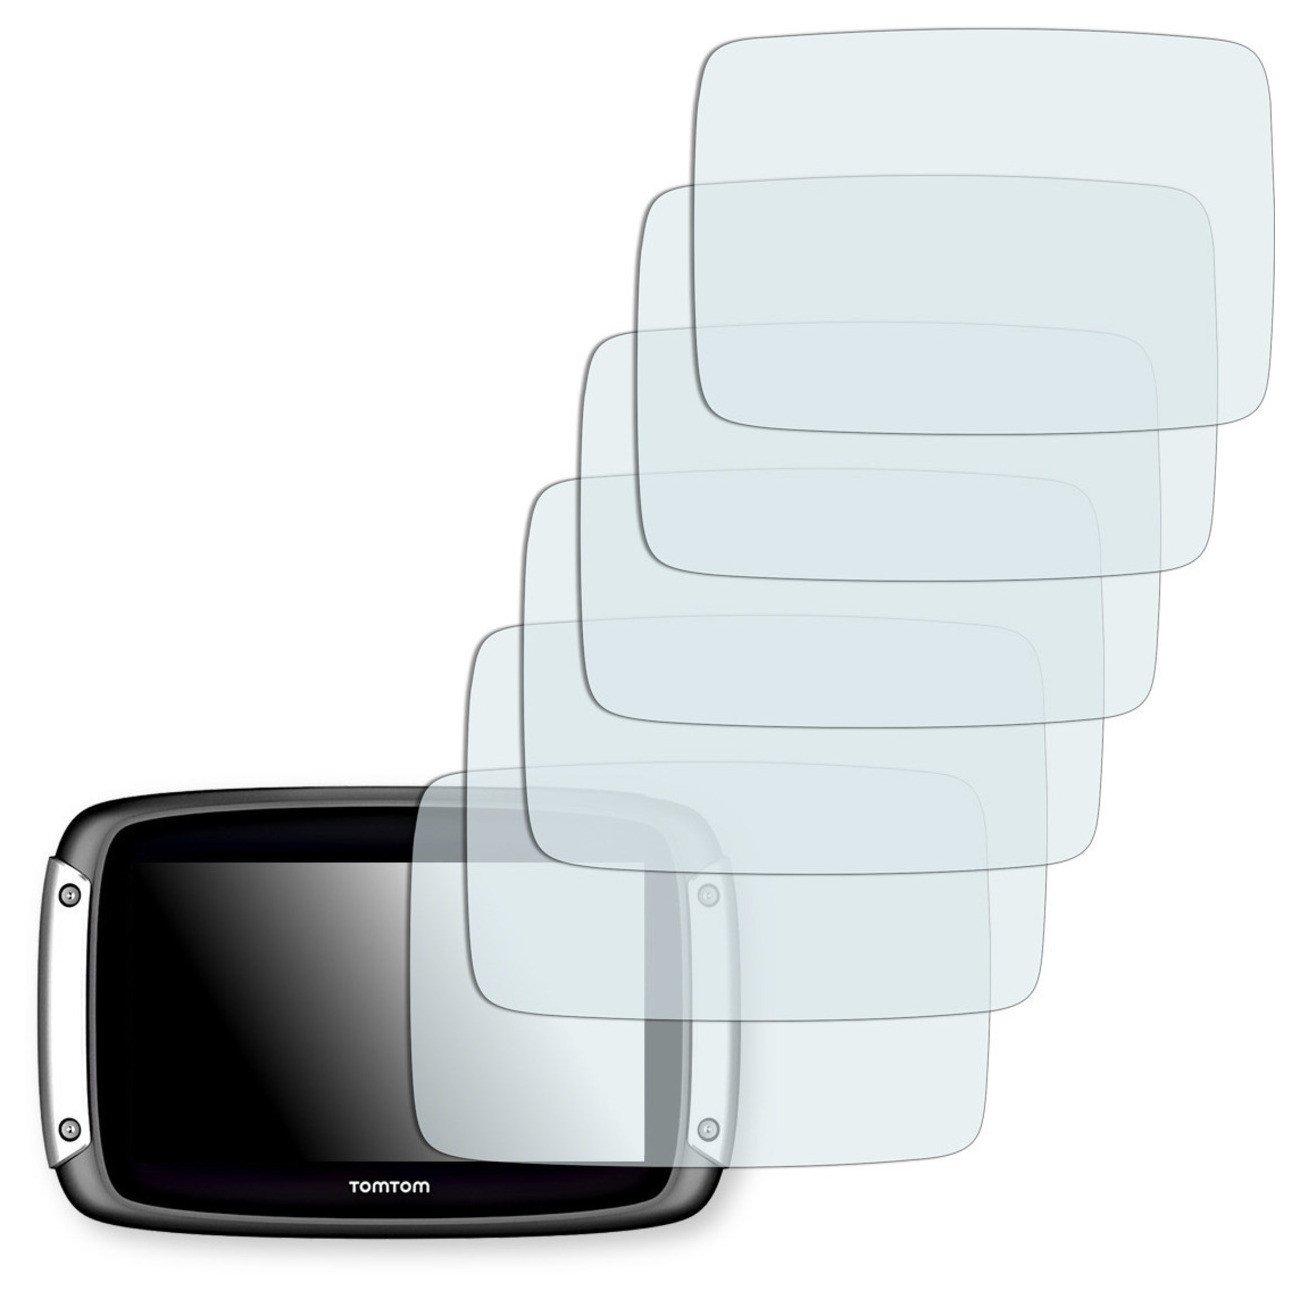 6 x protectores pantalla Golebo para TomTom Rider 410 L/ámina protectora adhesiva invisible Crystal Clear Fabricado en Alemania.